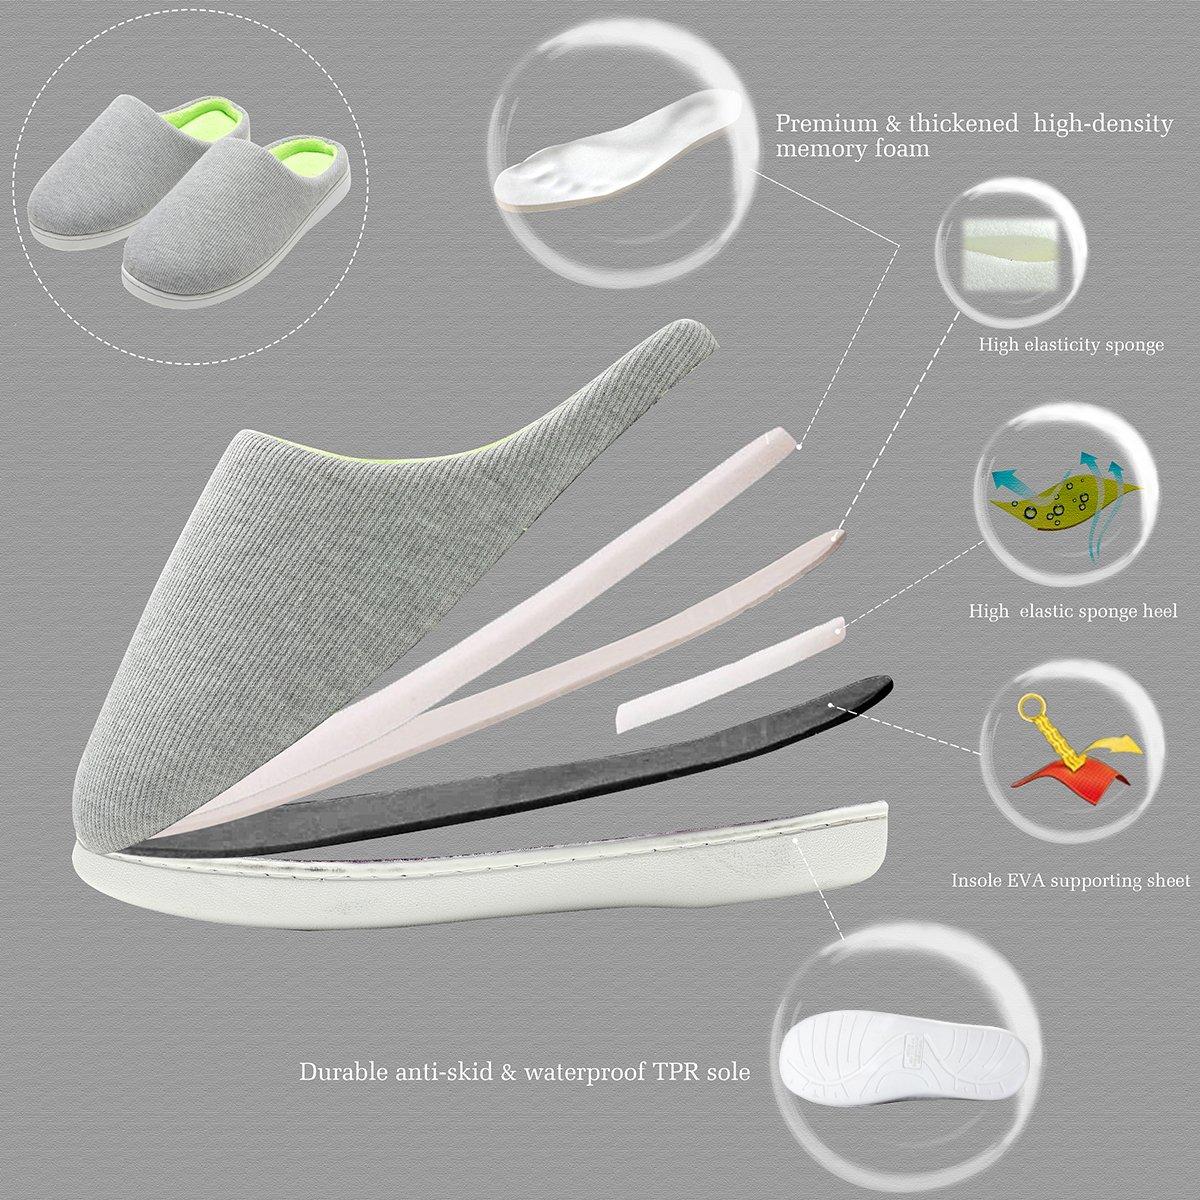 e20cf72b0b5 FLY HAWK Mens Memory Foam Plush House Slippers Two-Tone Slip On Indoor  Outdoor  Shoes CAMJL07034 men